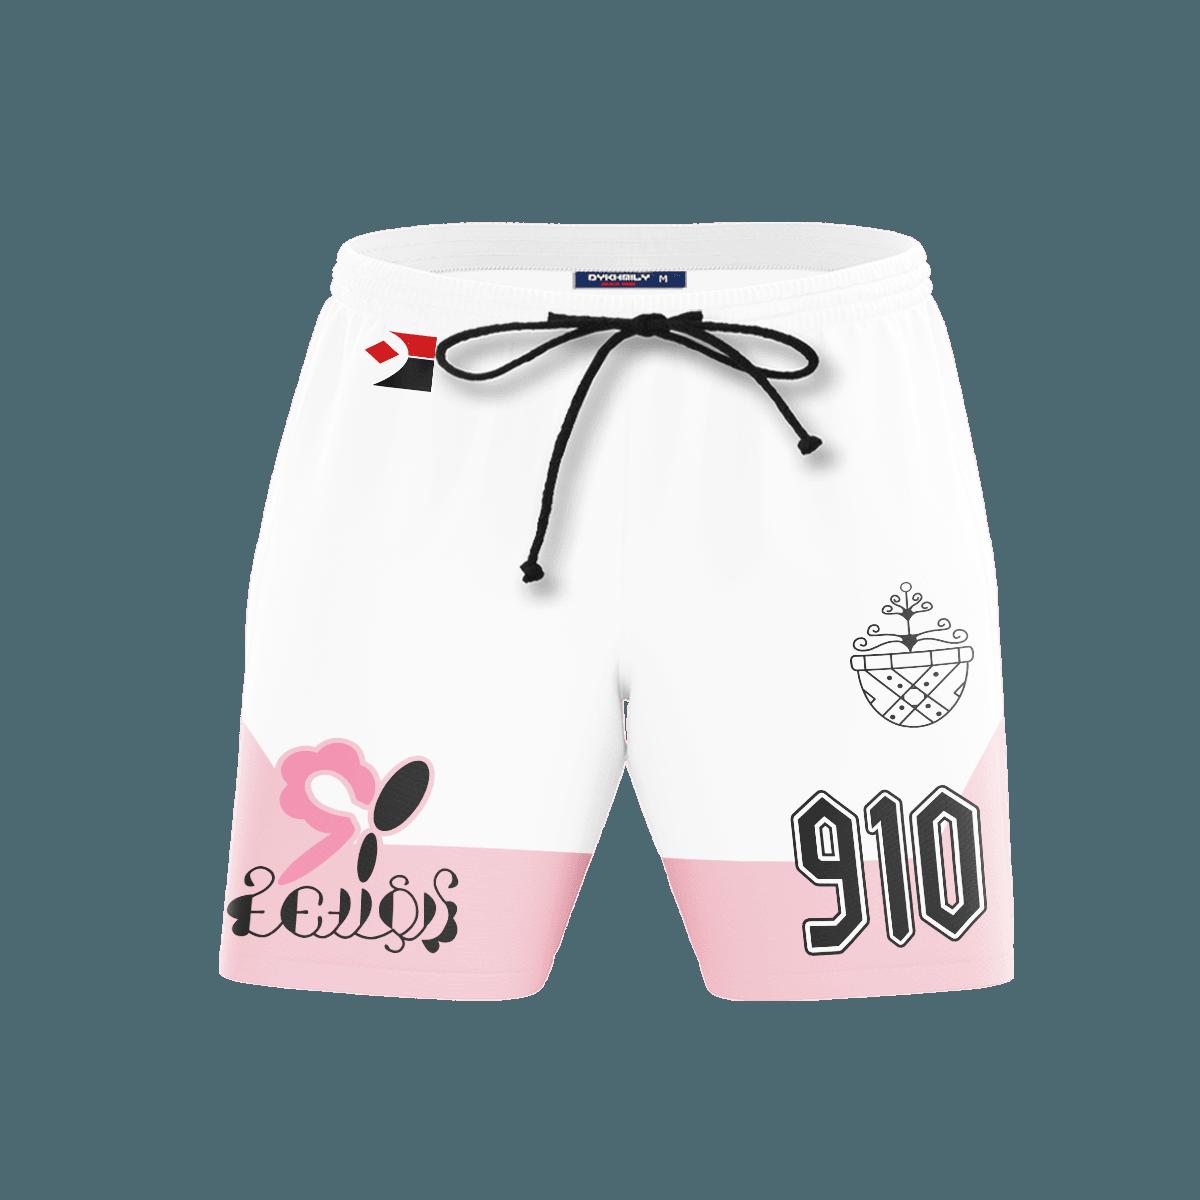 Pokemon Fairy Uniform Beach Shorts FDM3107 S Official Anime Swimsuit Merch